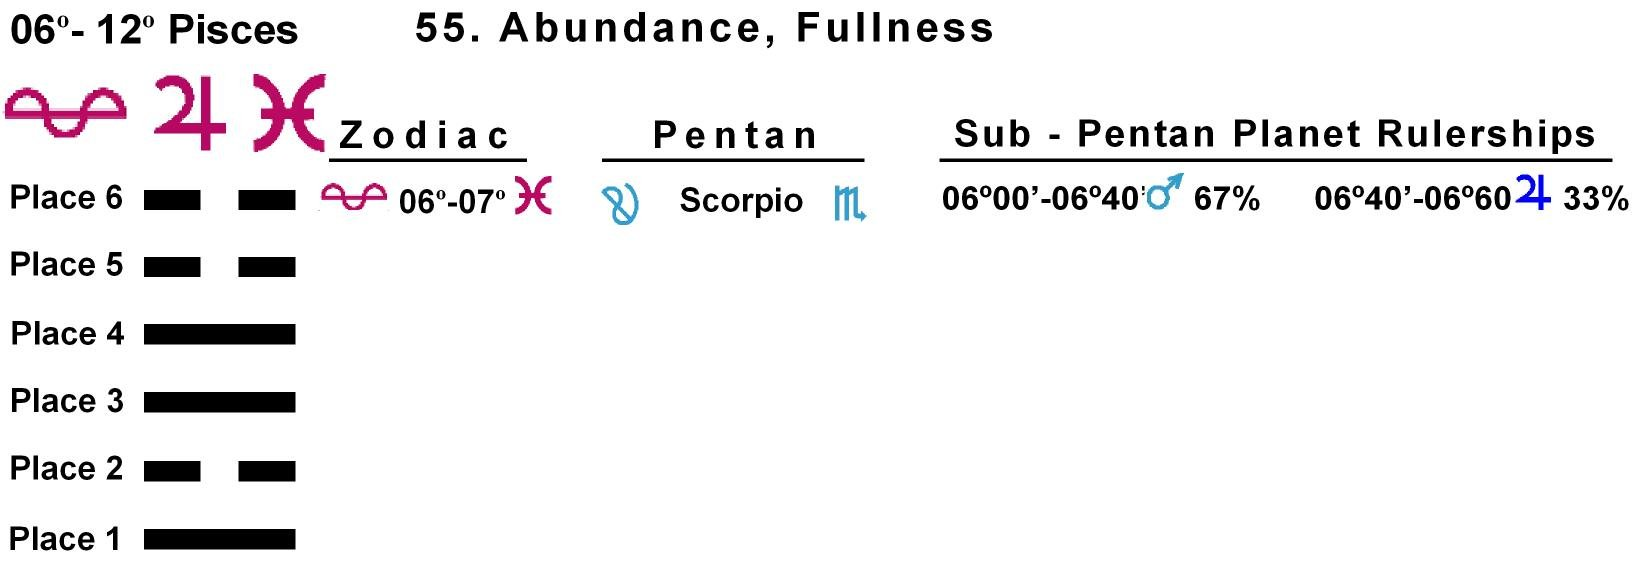 Pent-lines-12PI 06-07 Hx-55 Abundance